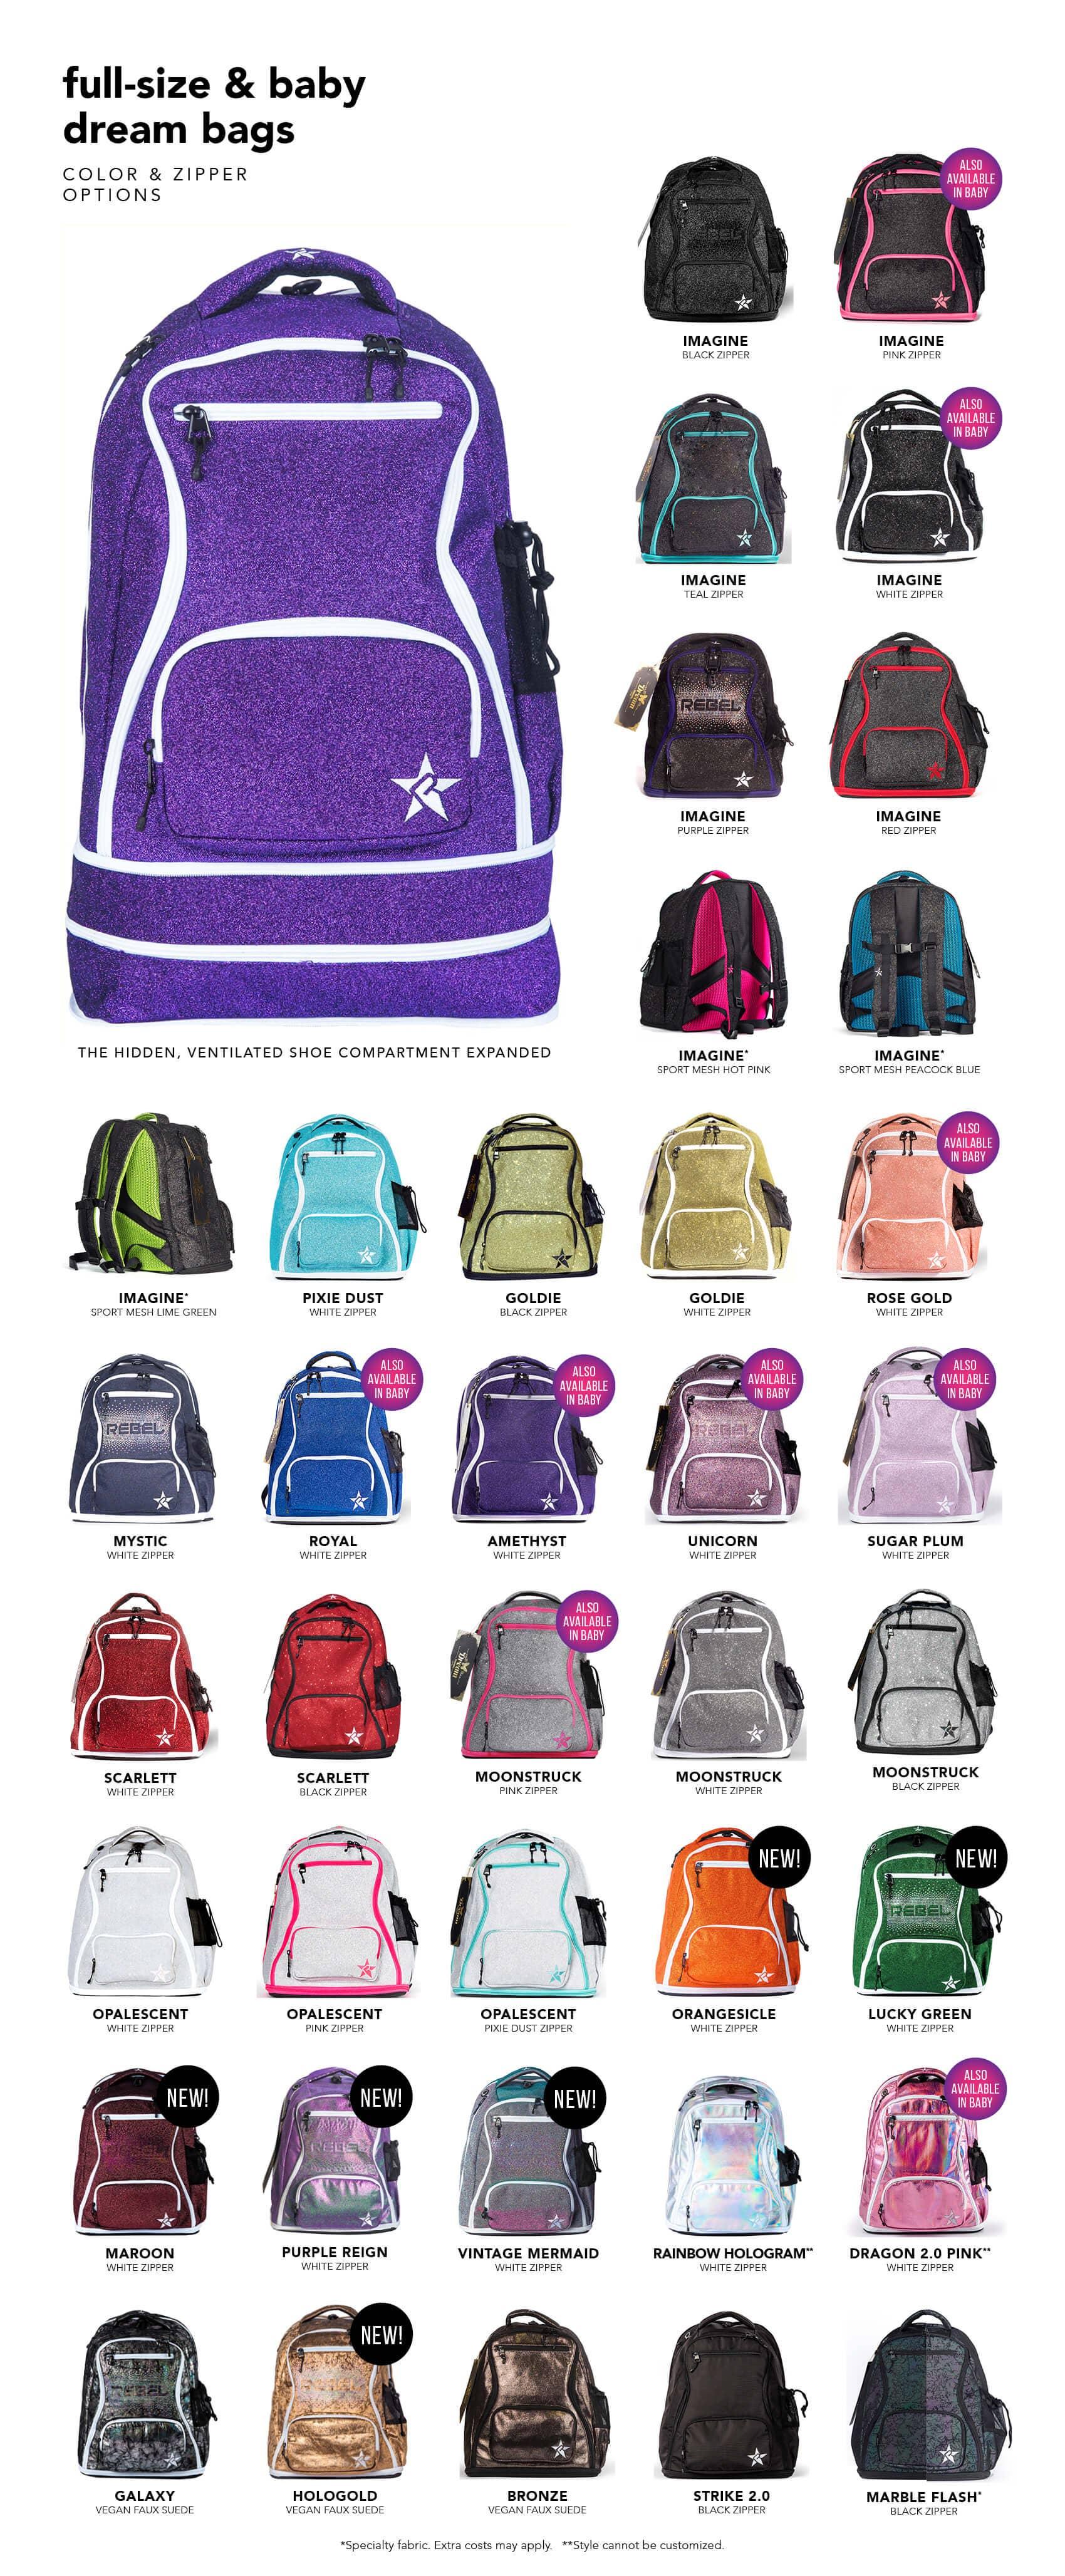 Dream Bag Color Options